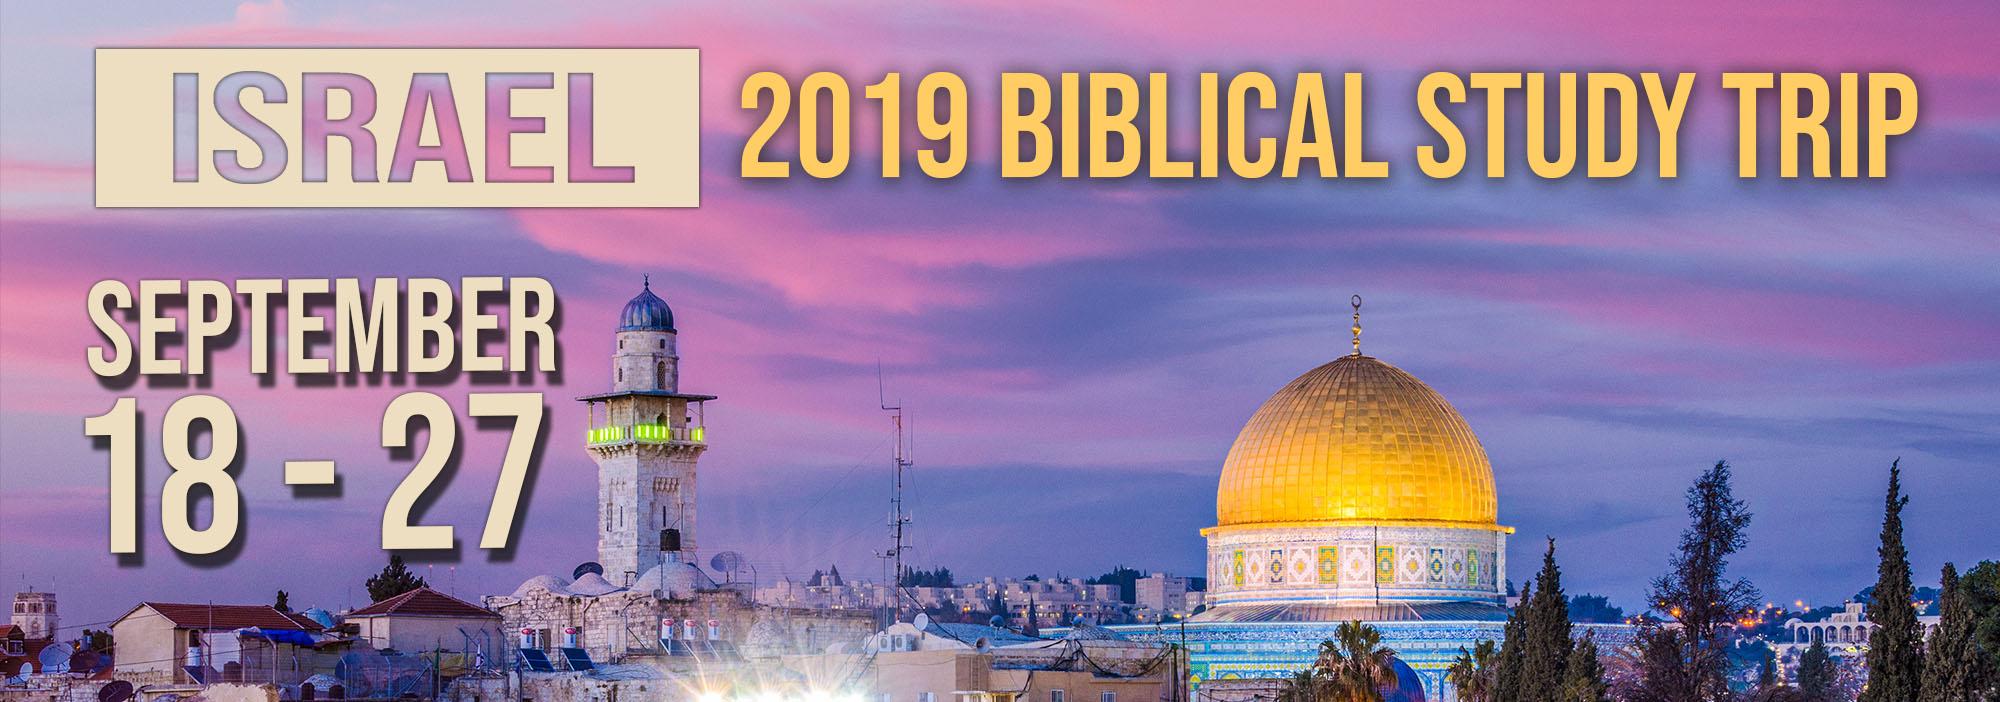 Israel web banner.jpg